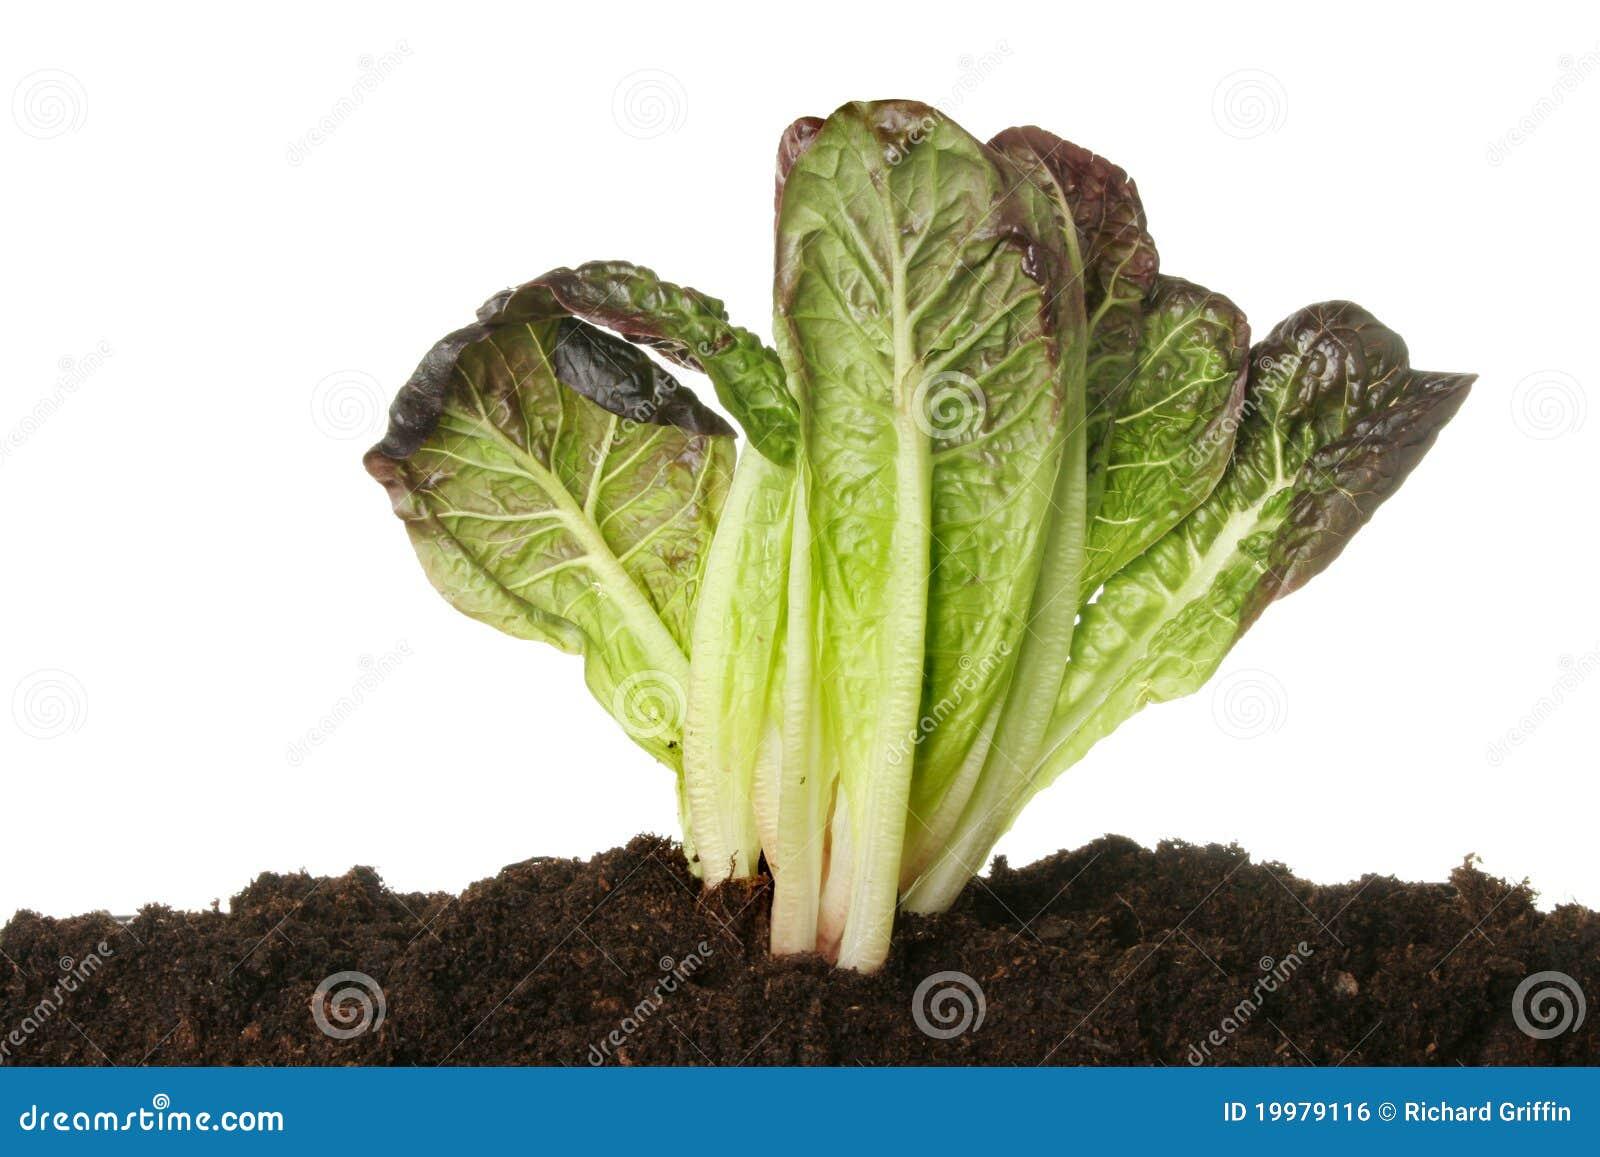 Lettuce In Soil Stock Photo Image Of Lettuce White 19979116